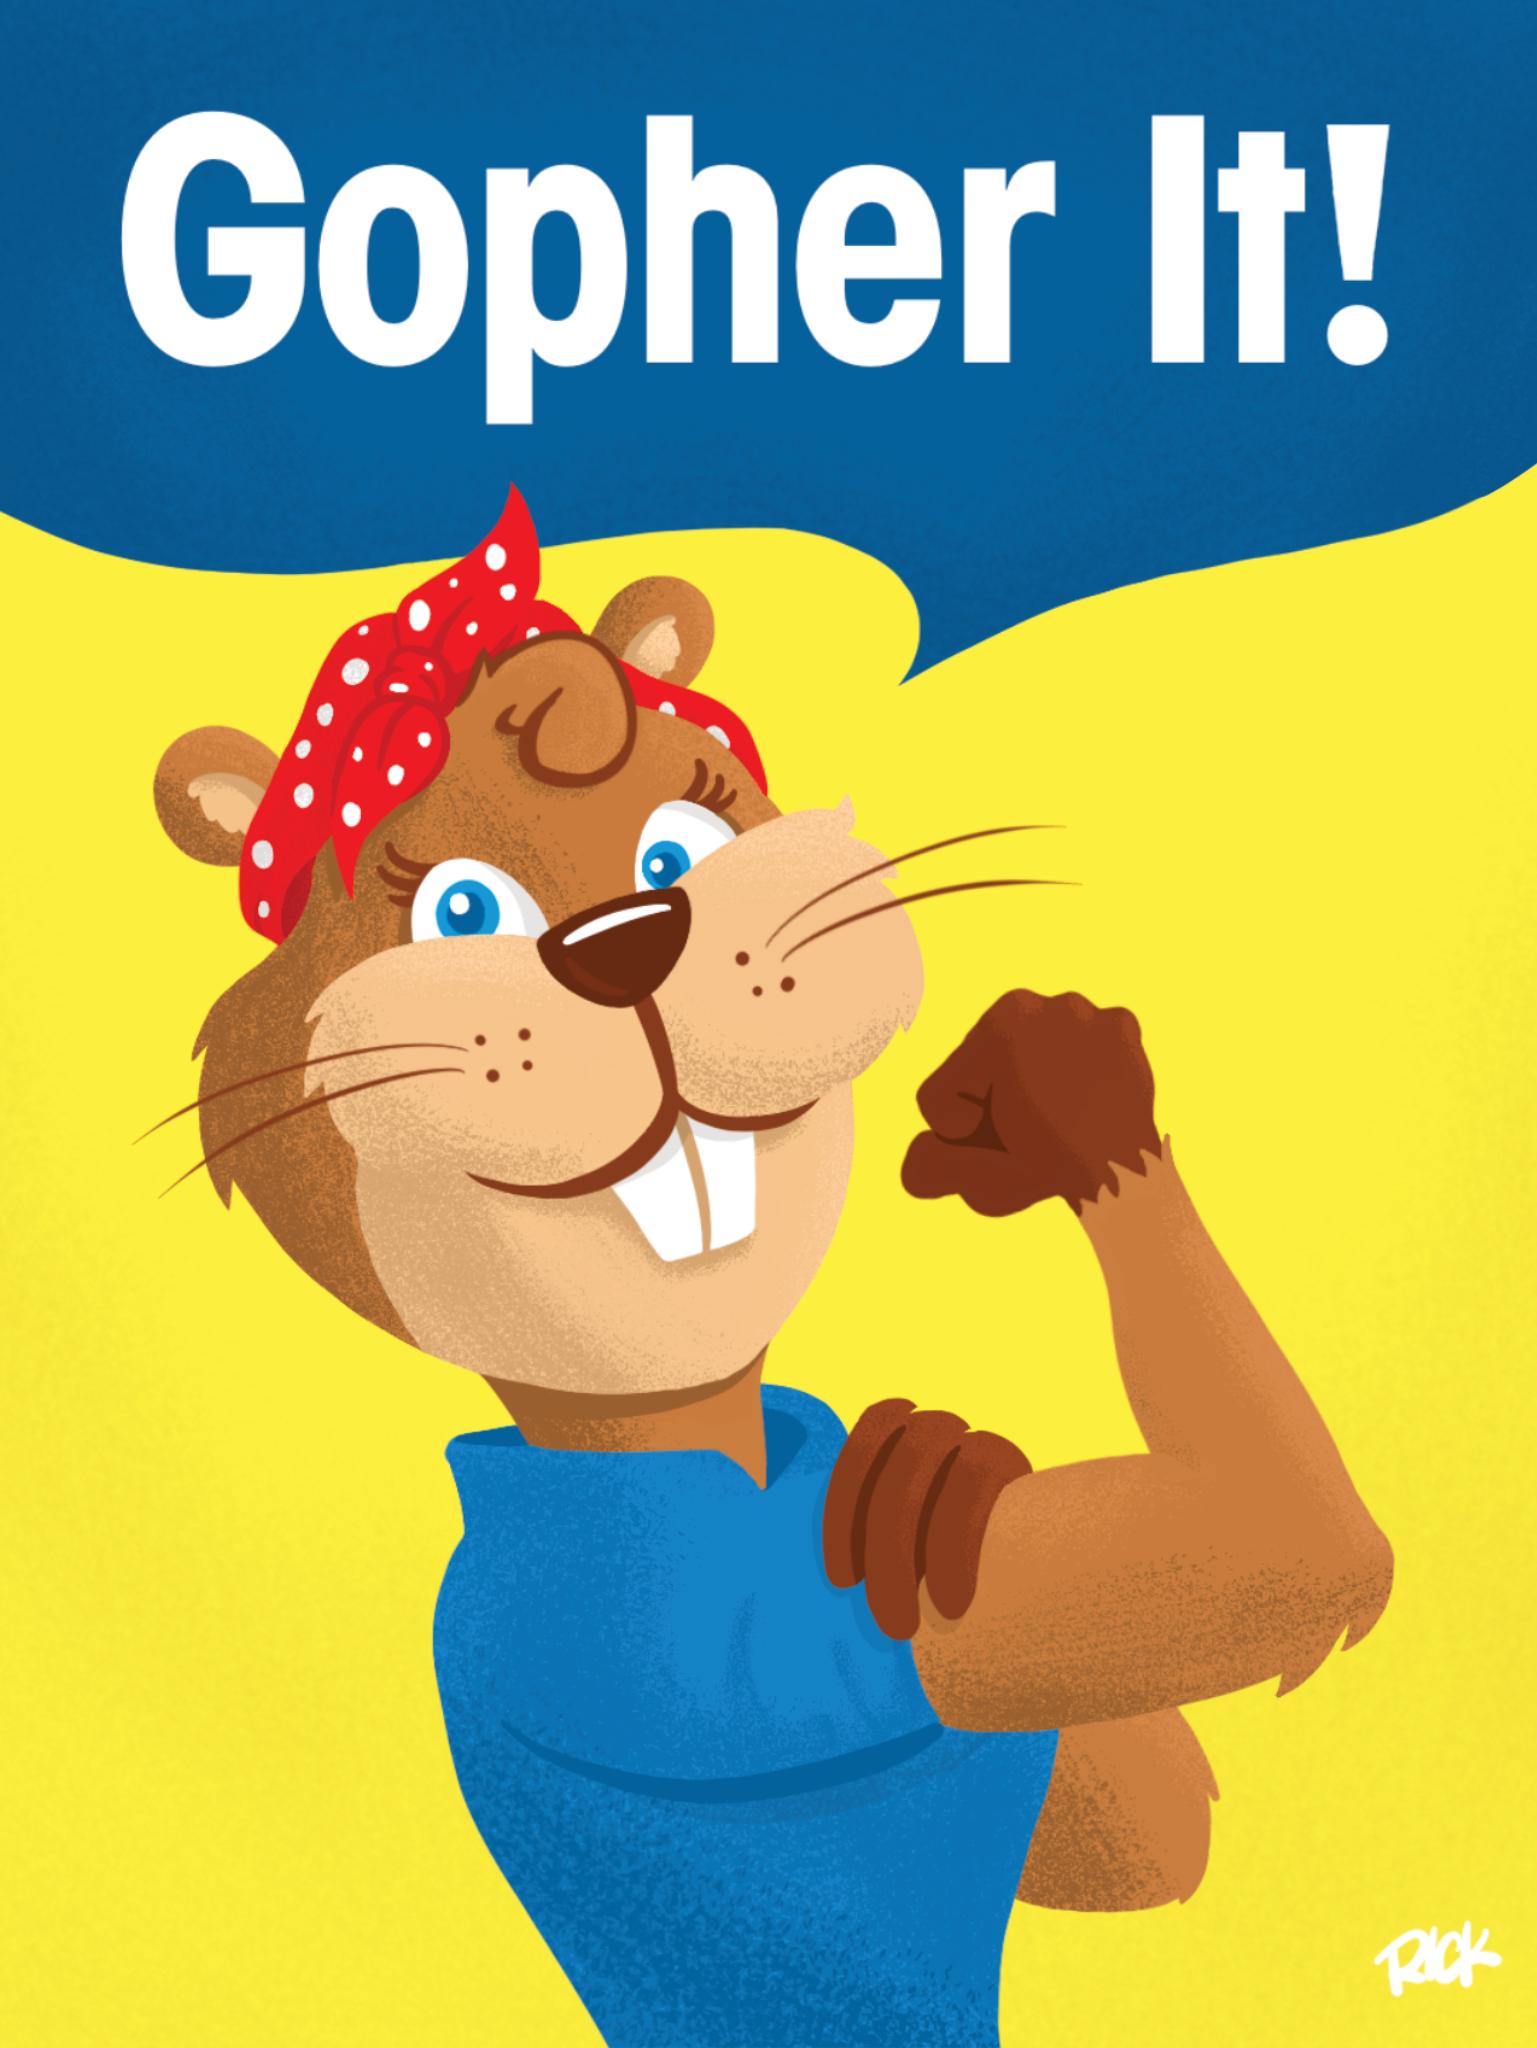 Gopher It! Rosie the Riveter Cartoon Poster